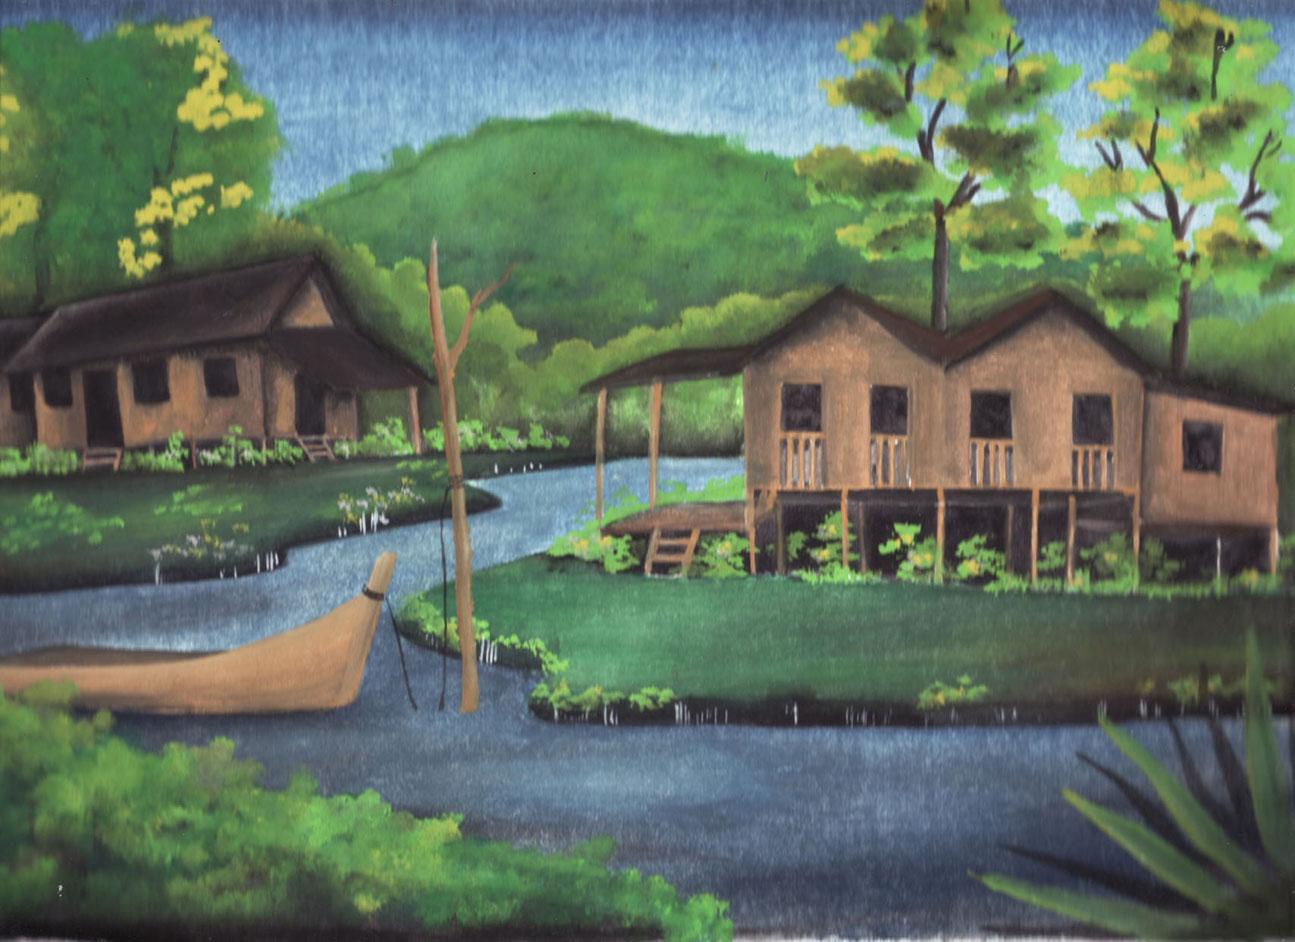 pin lukisan pemandangan di desa i2 pelautscom on pinterest